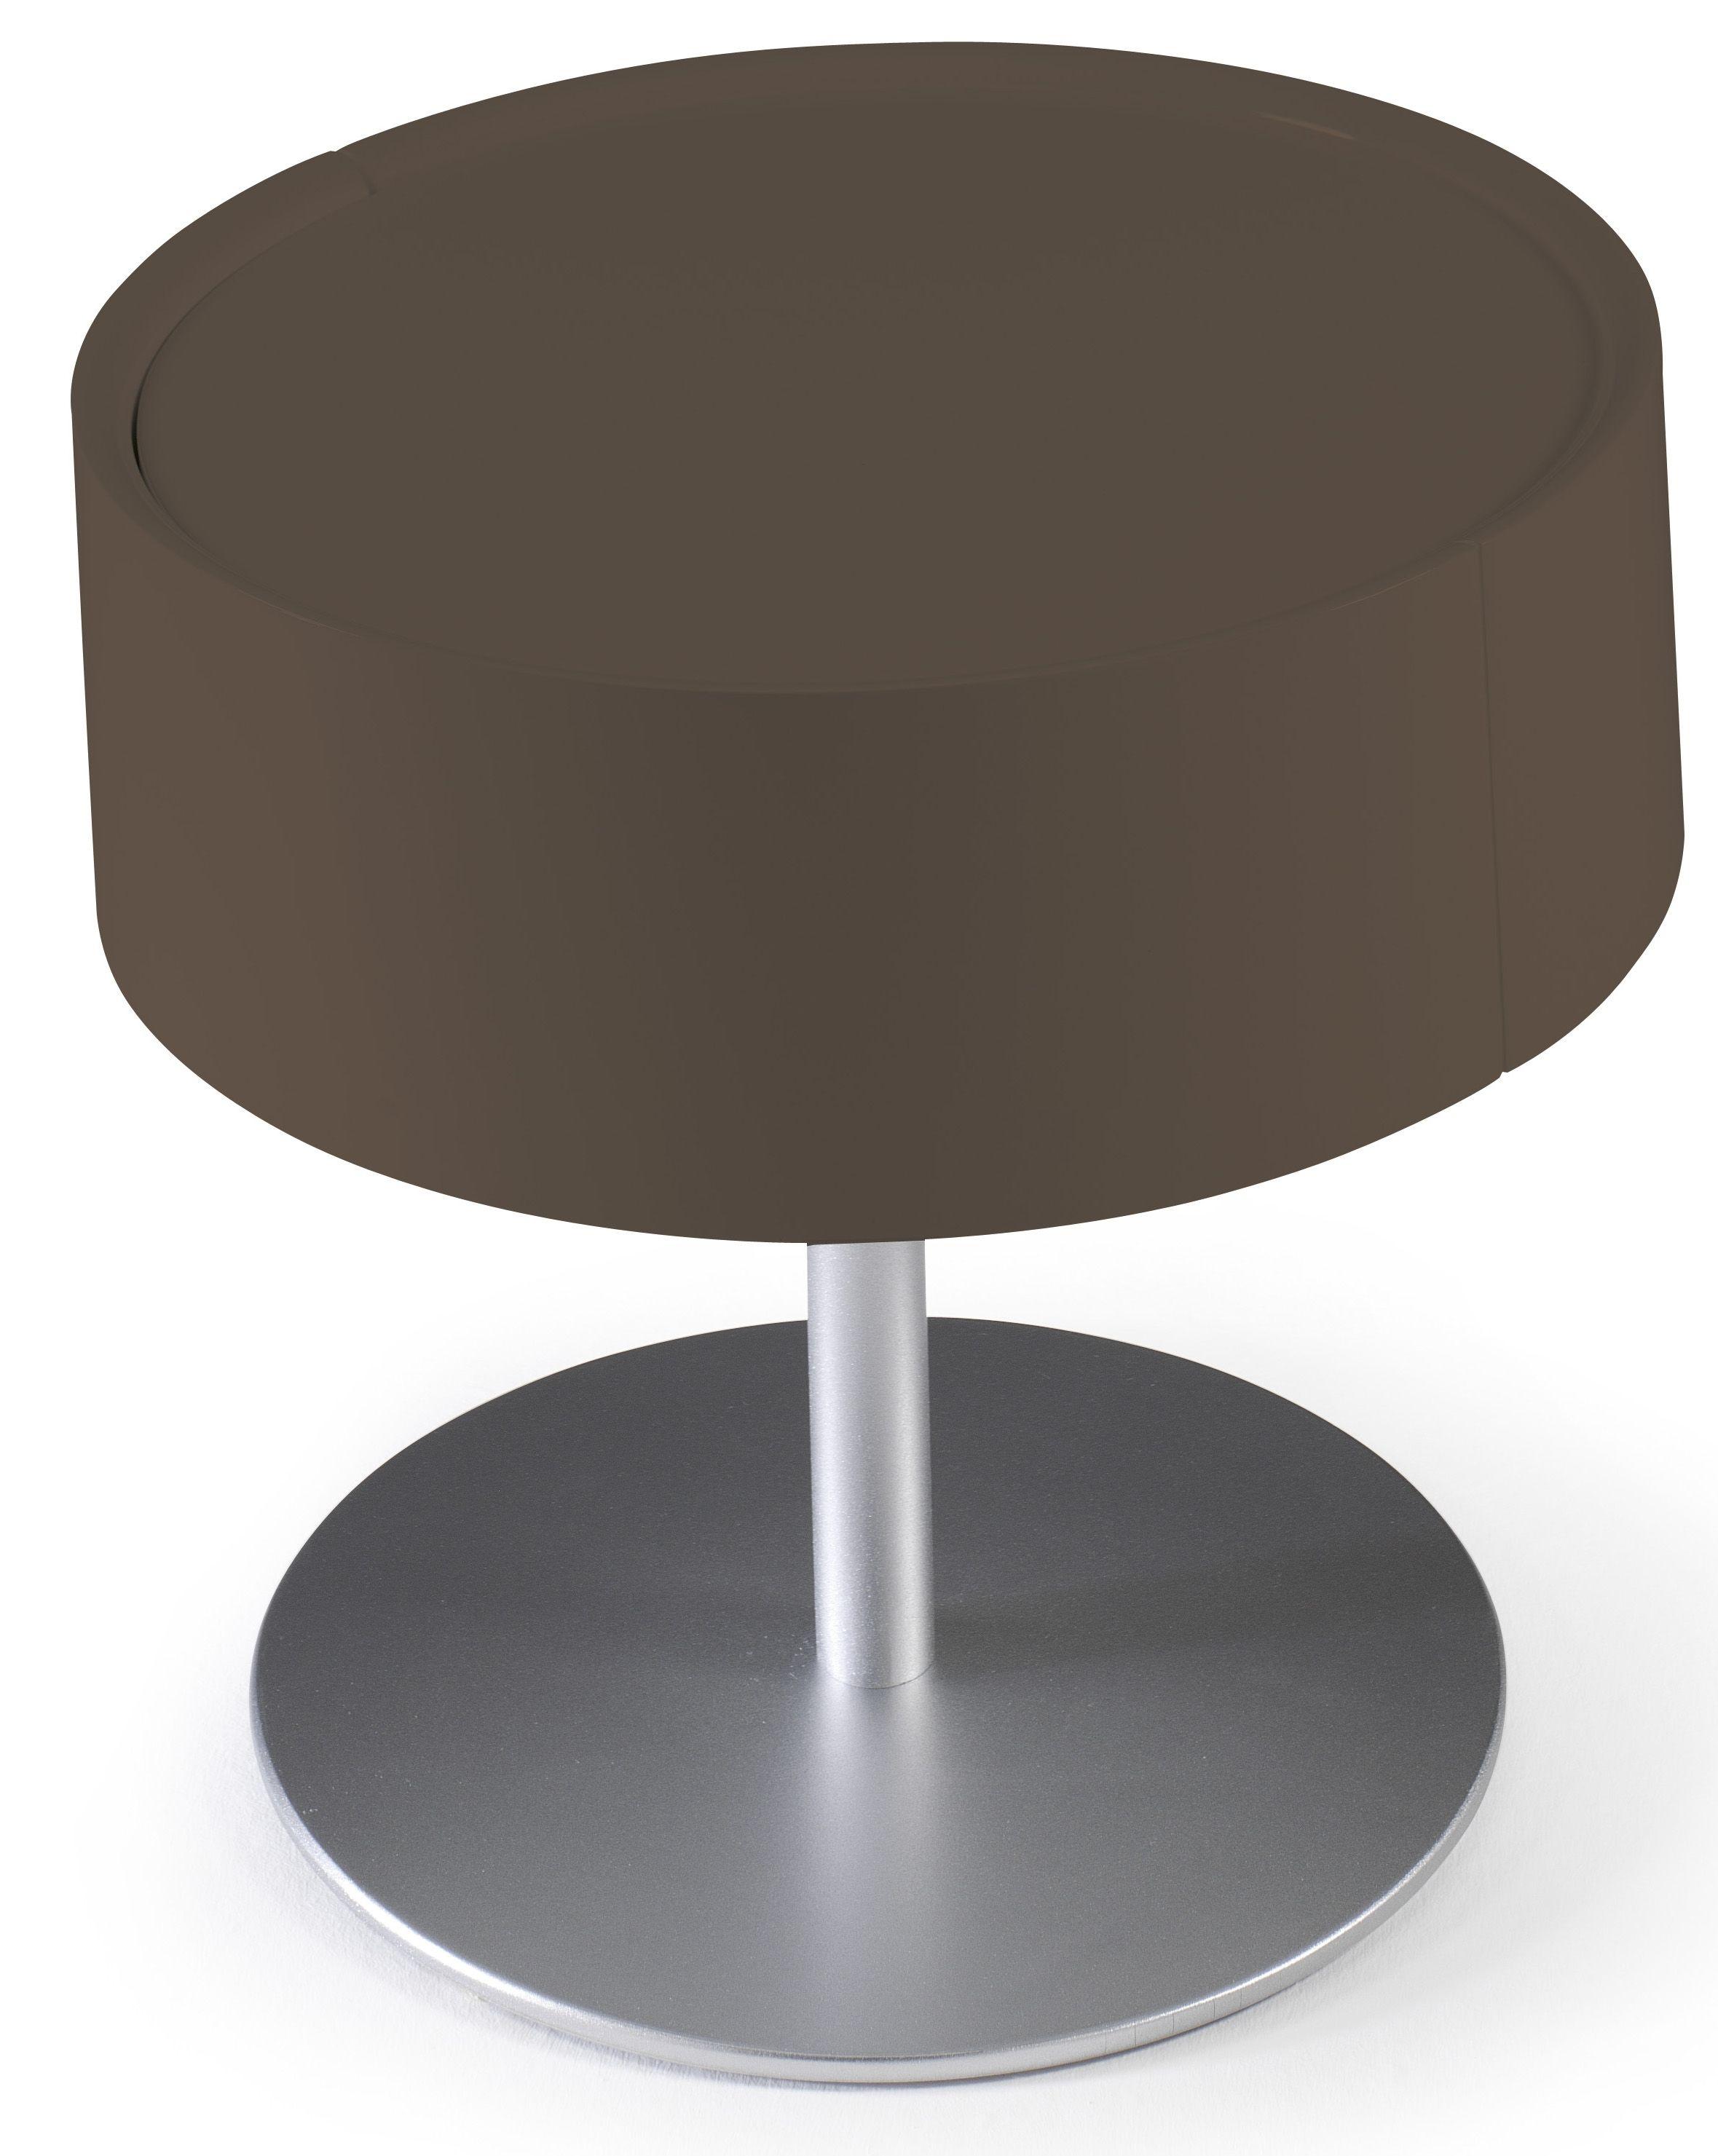 Designer Table De Chevet Design Marron Laque Torsada Lestendances Fr En 2020 Table De Chevet Design Table De Chevet Chevet Design